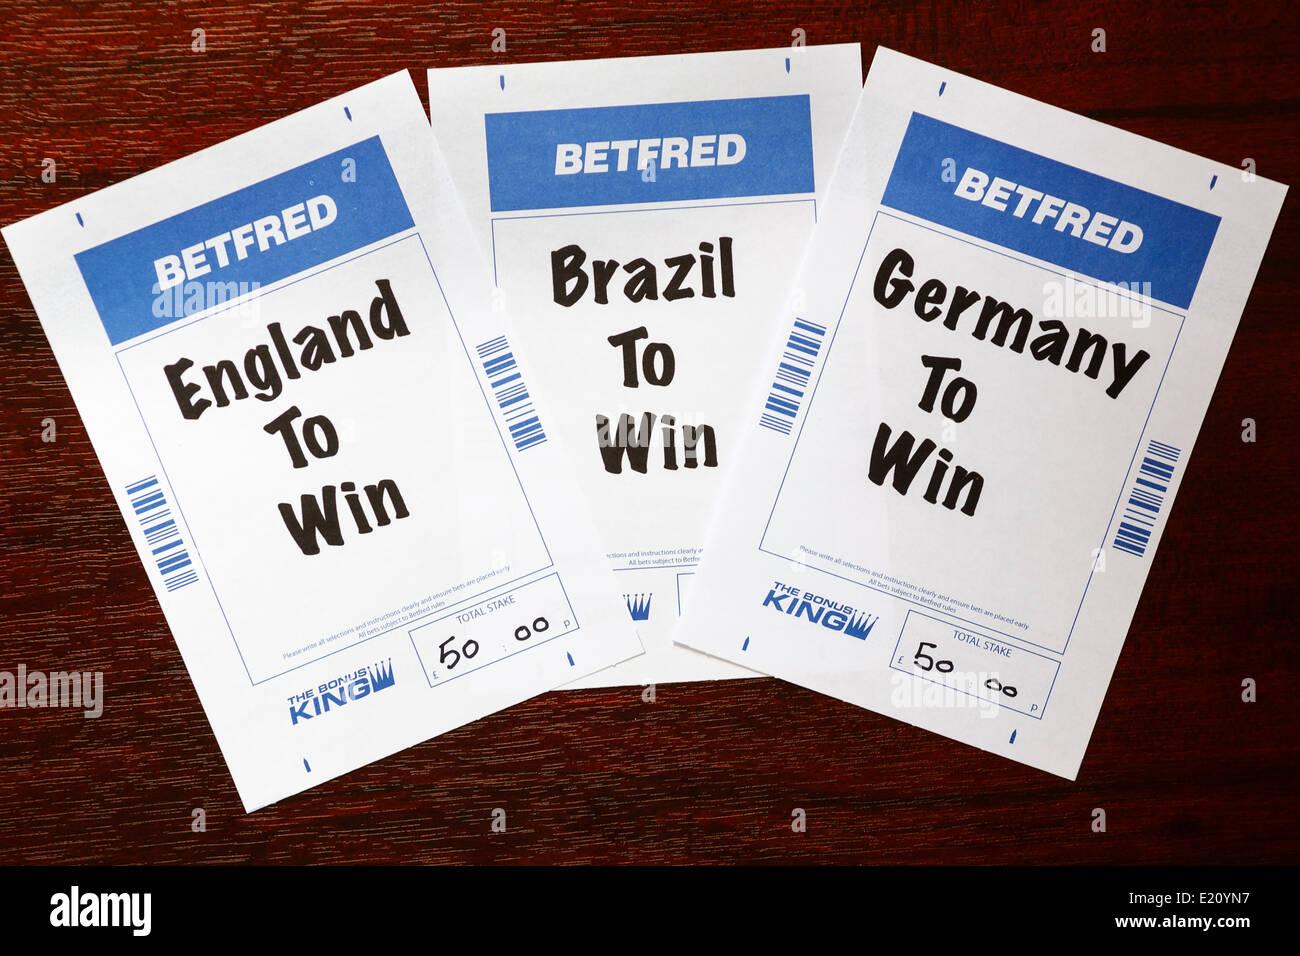 betfred football betting slips